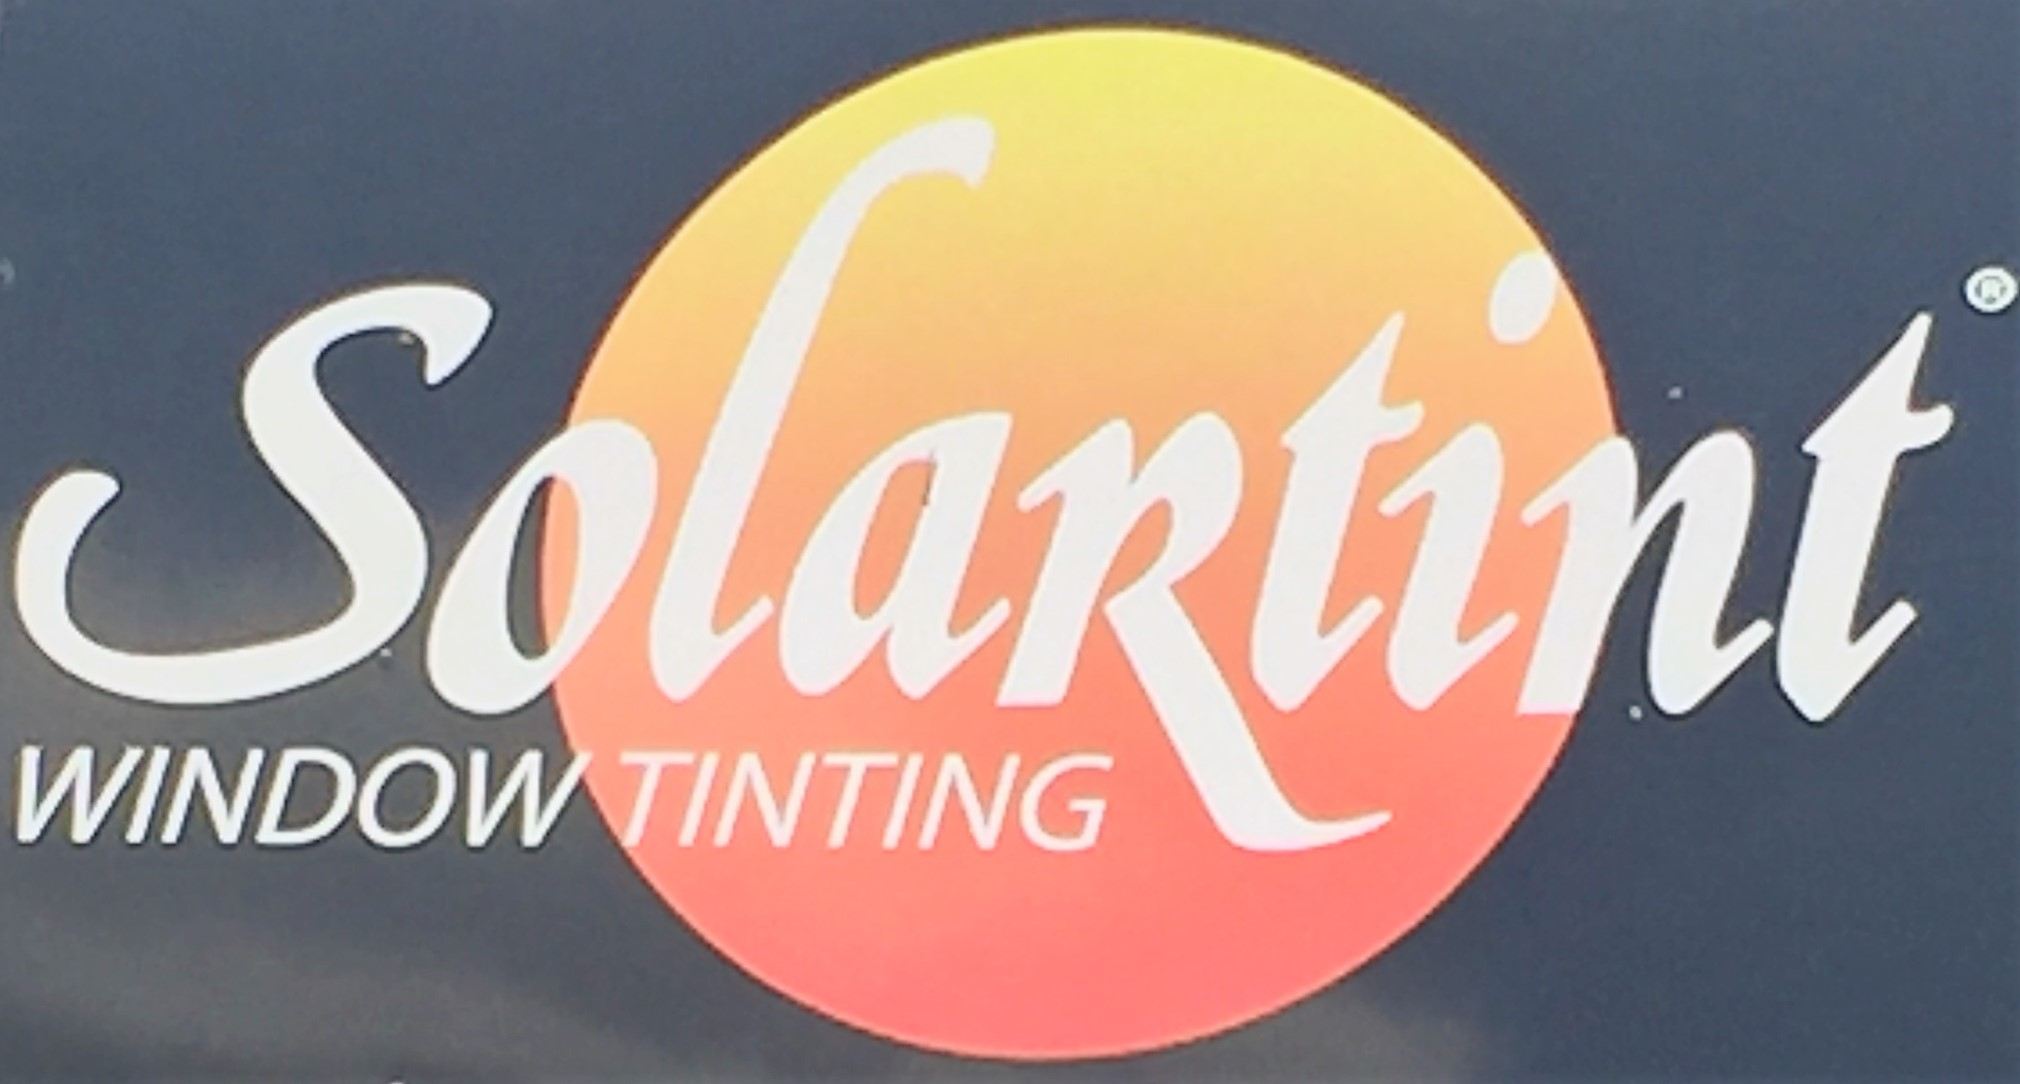 Solartint